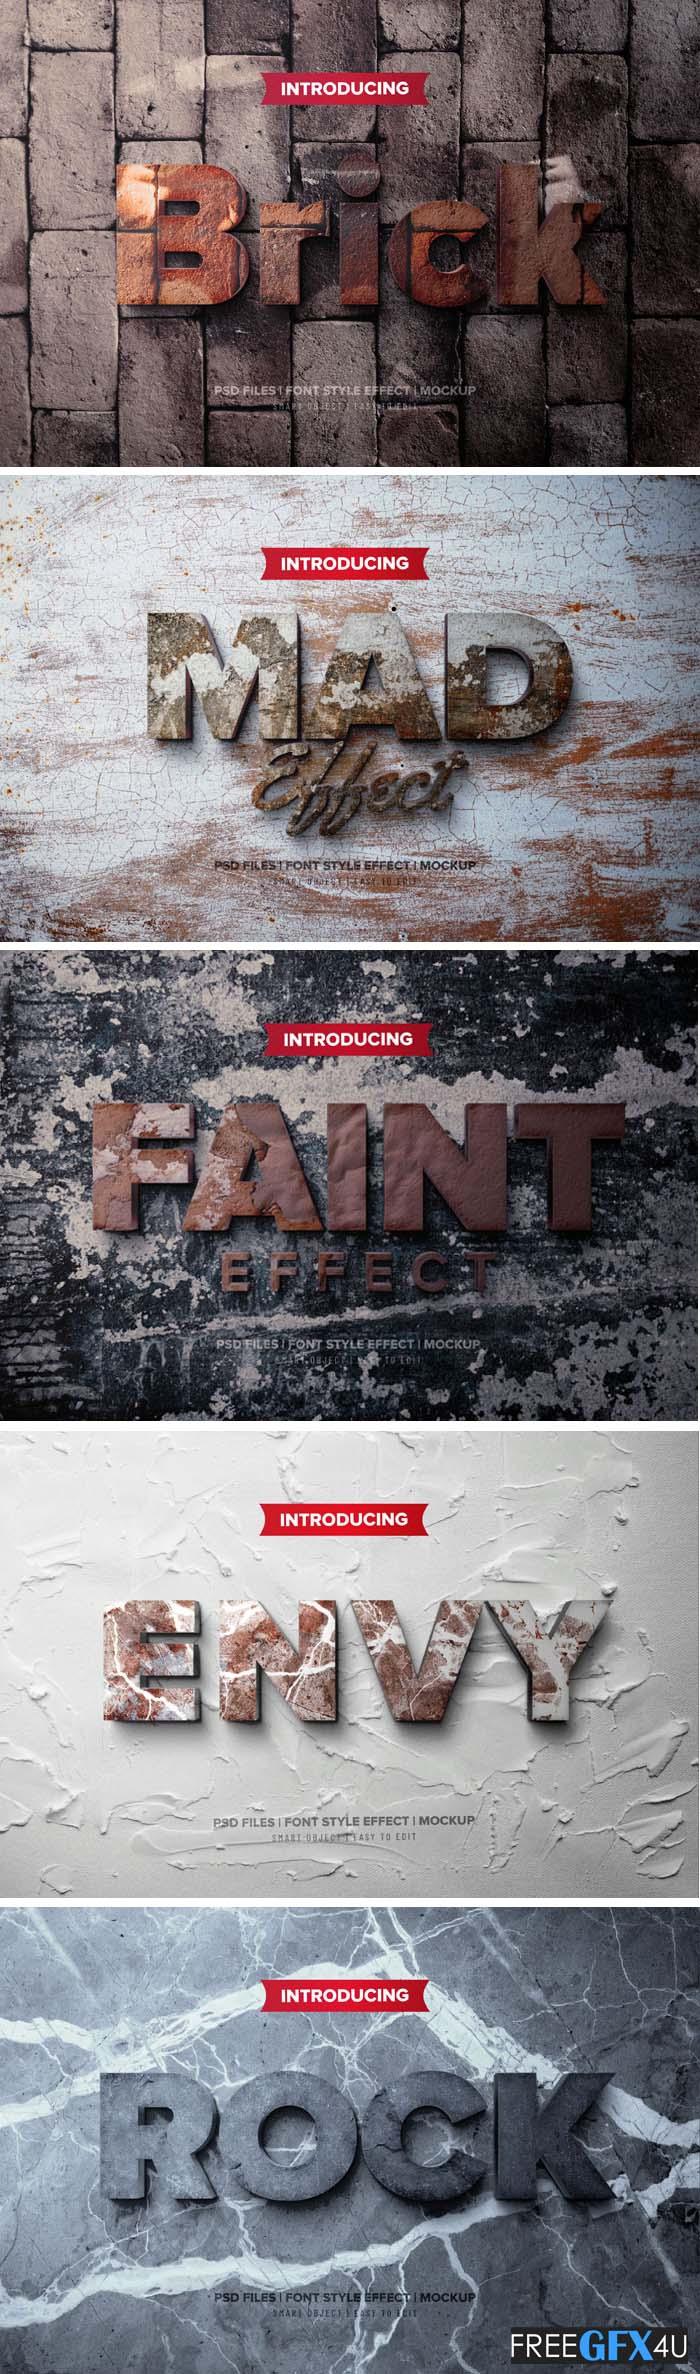 3D Text Effect PSD Mockup